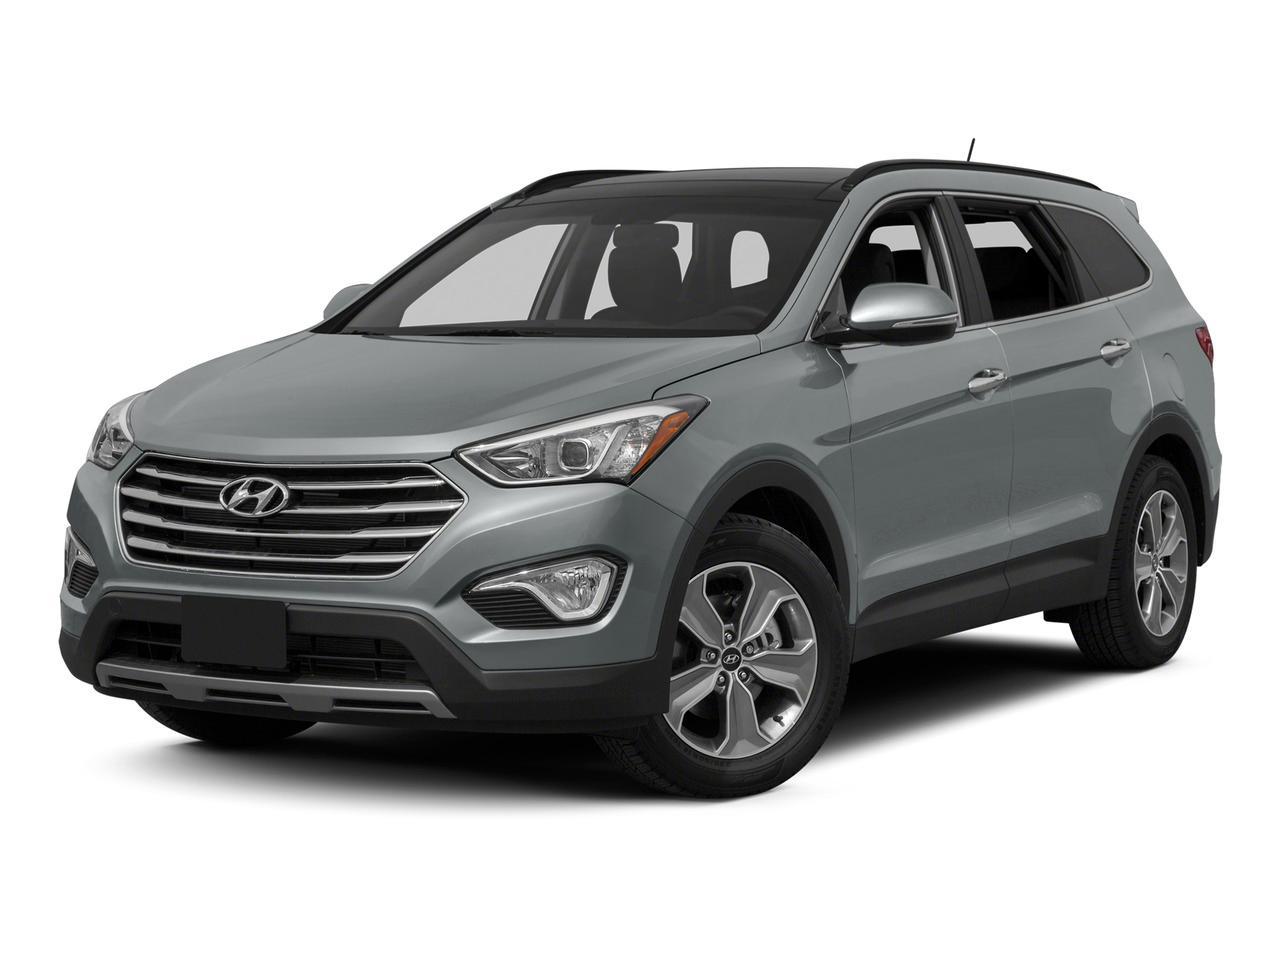 2015 Hyundai Santa Fe Vehicle Photo in Odessa, TX 79762